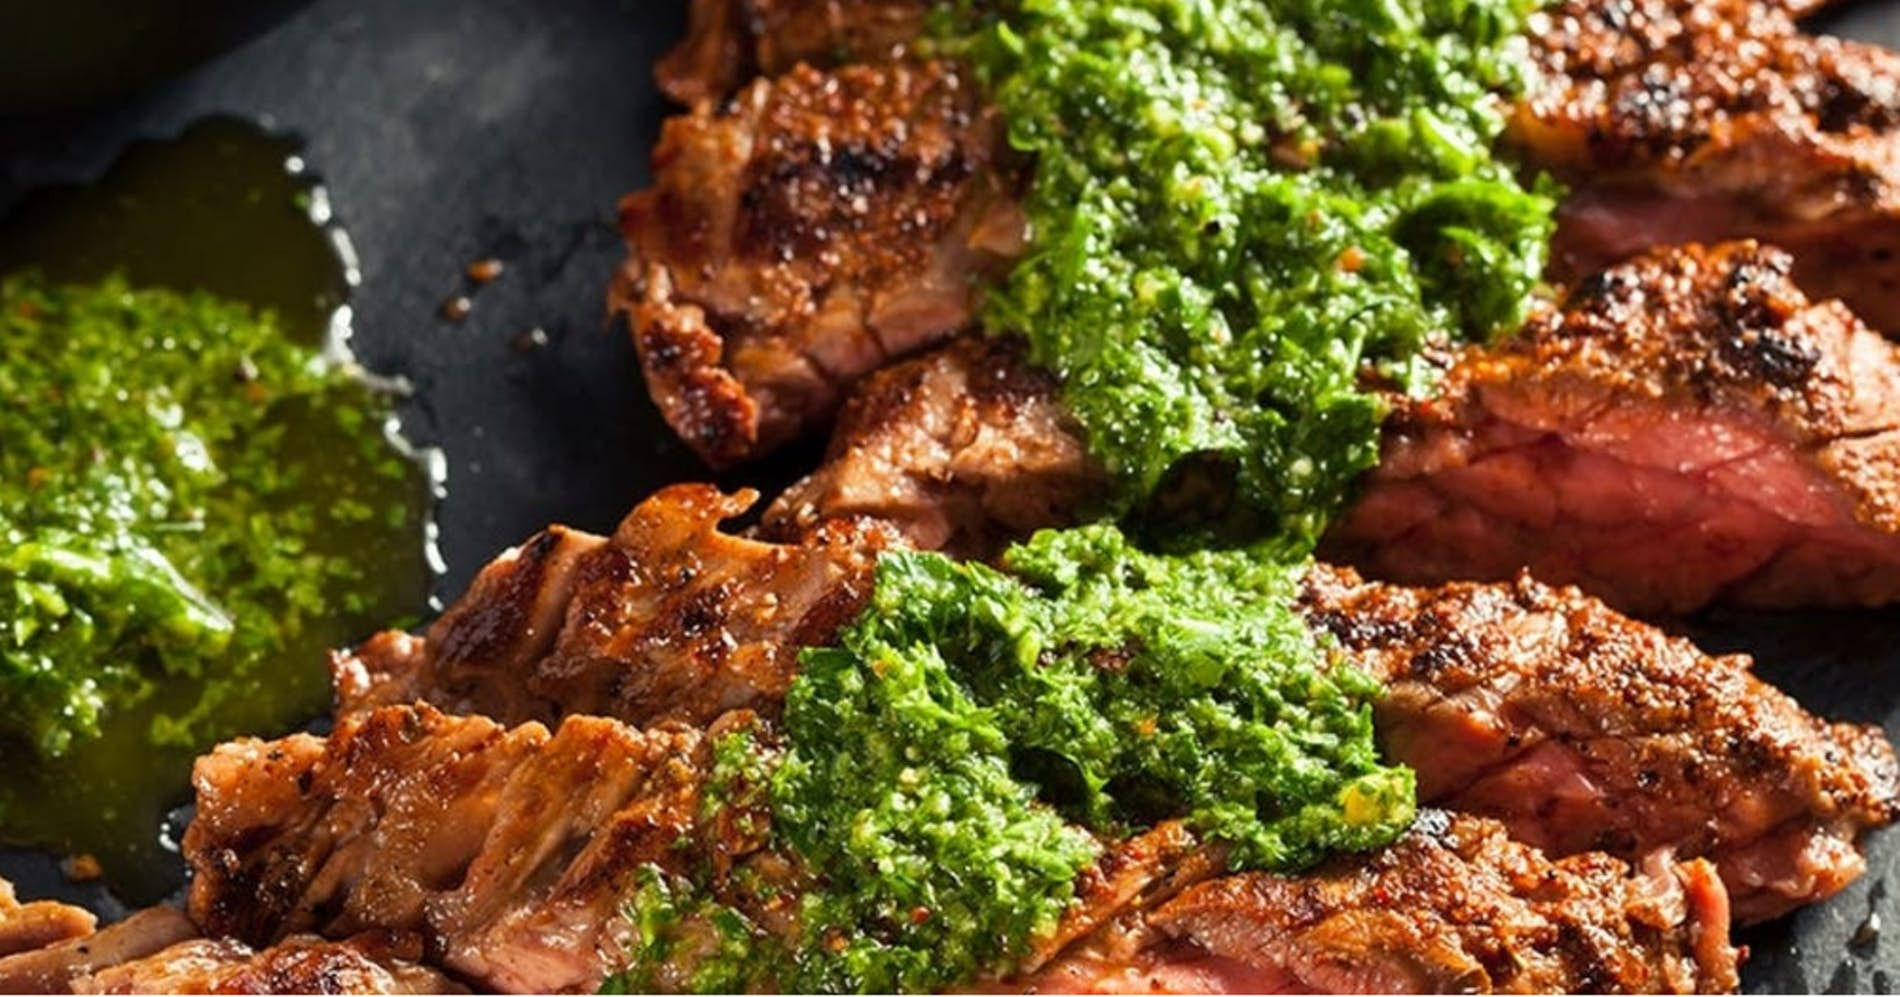 Carne Asada with Chimichurri Sauce